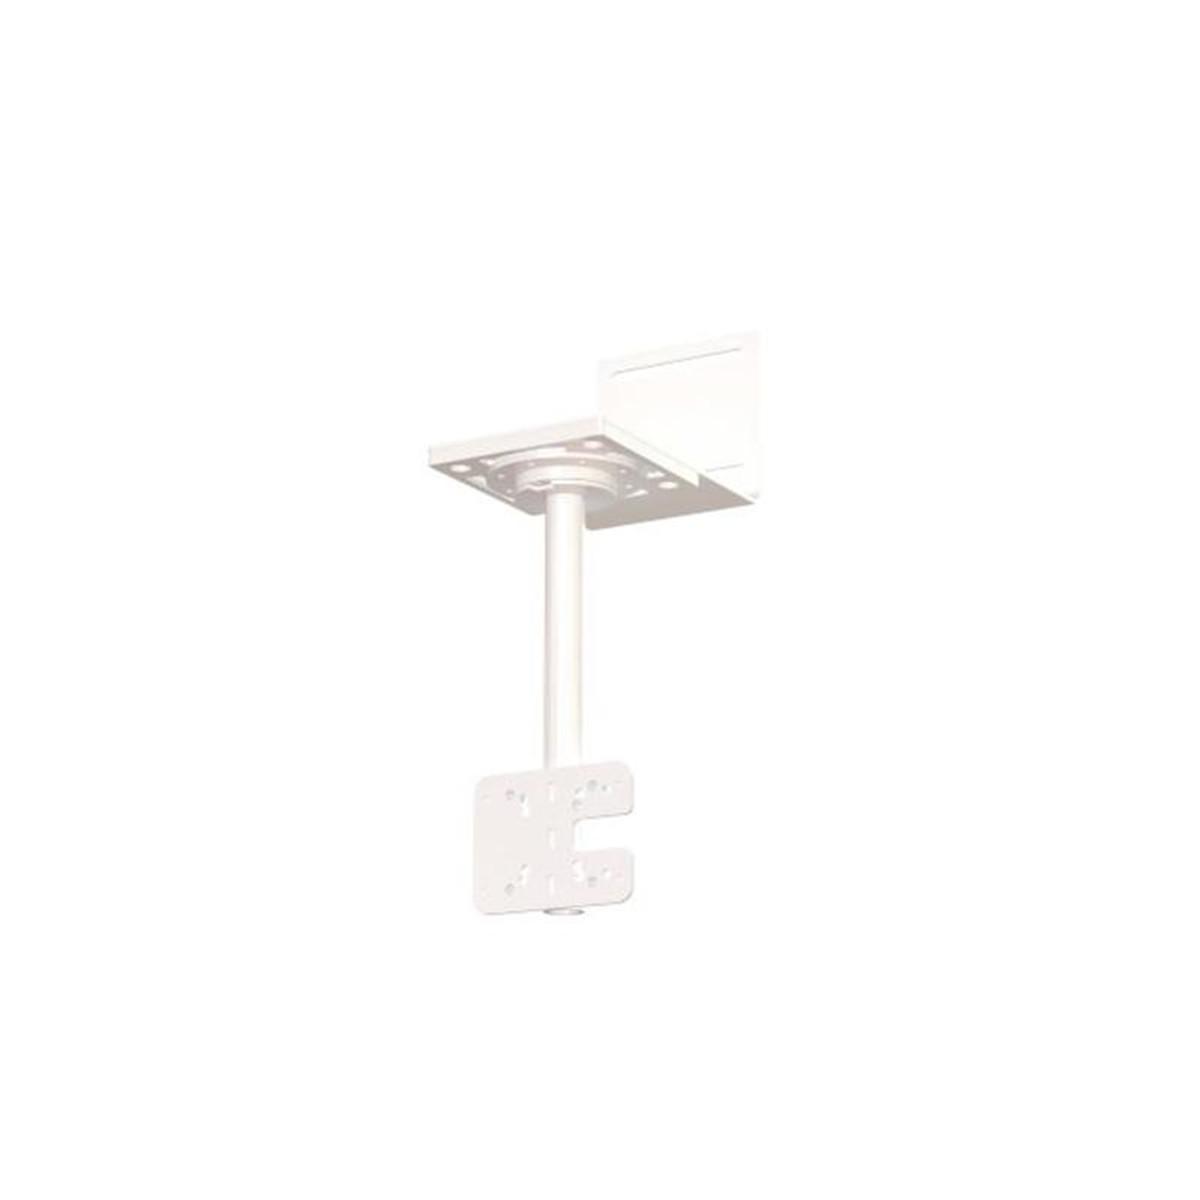 Cel-Fi Cel-Fi Antenna Ceiling/Wall Mount for GO X/PRO/QUATRA